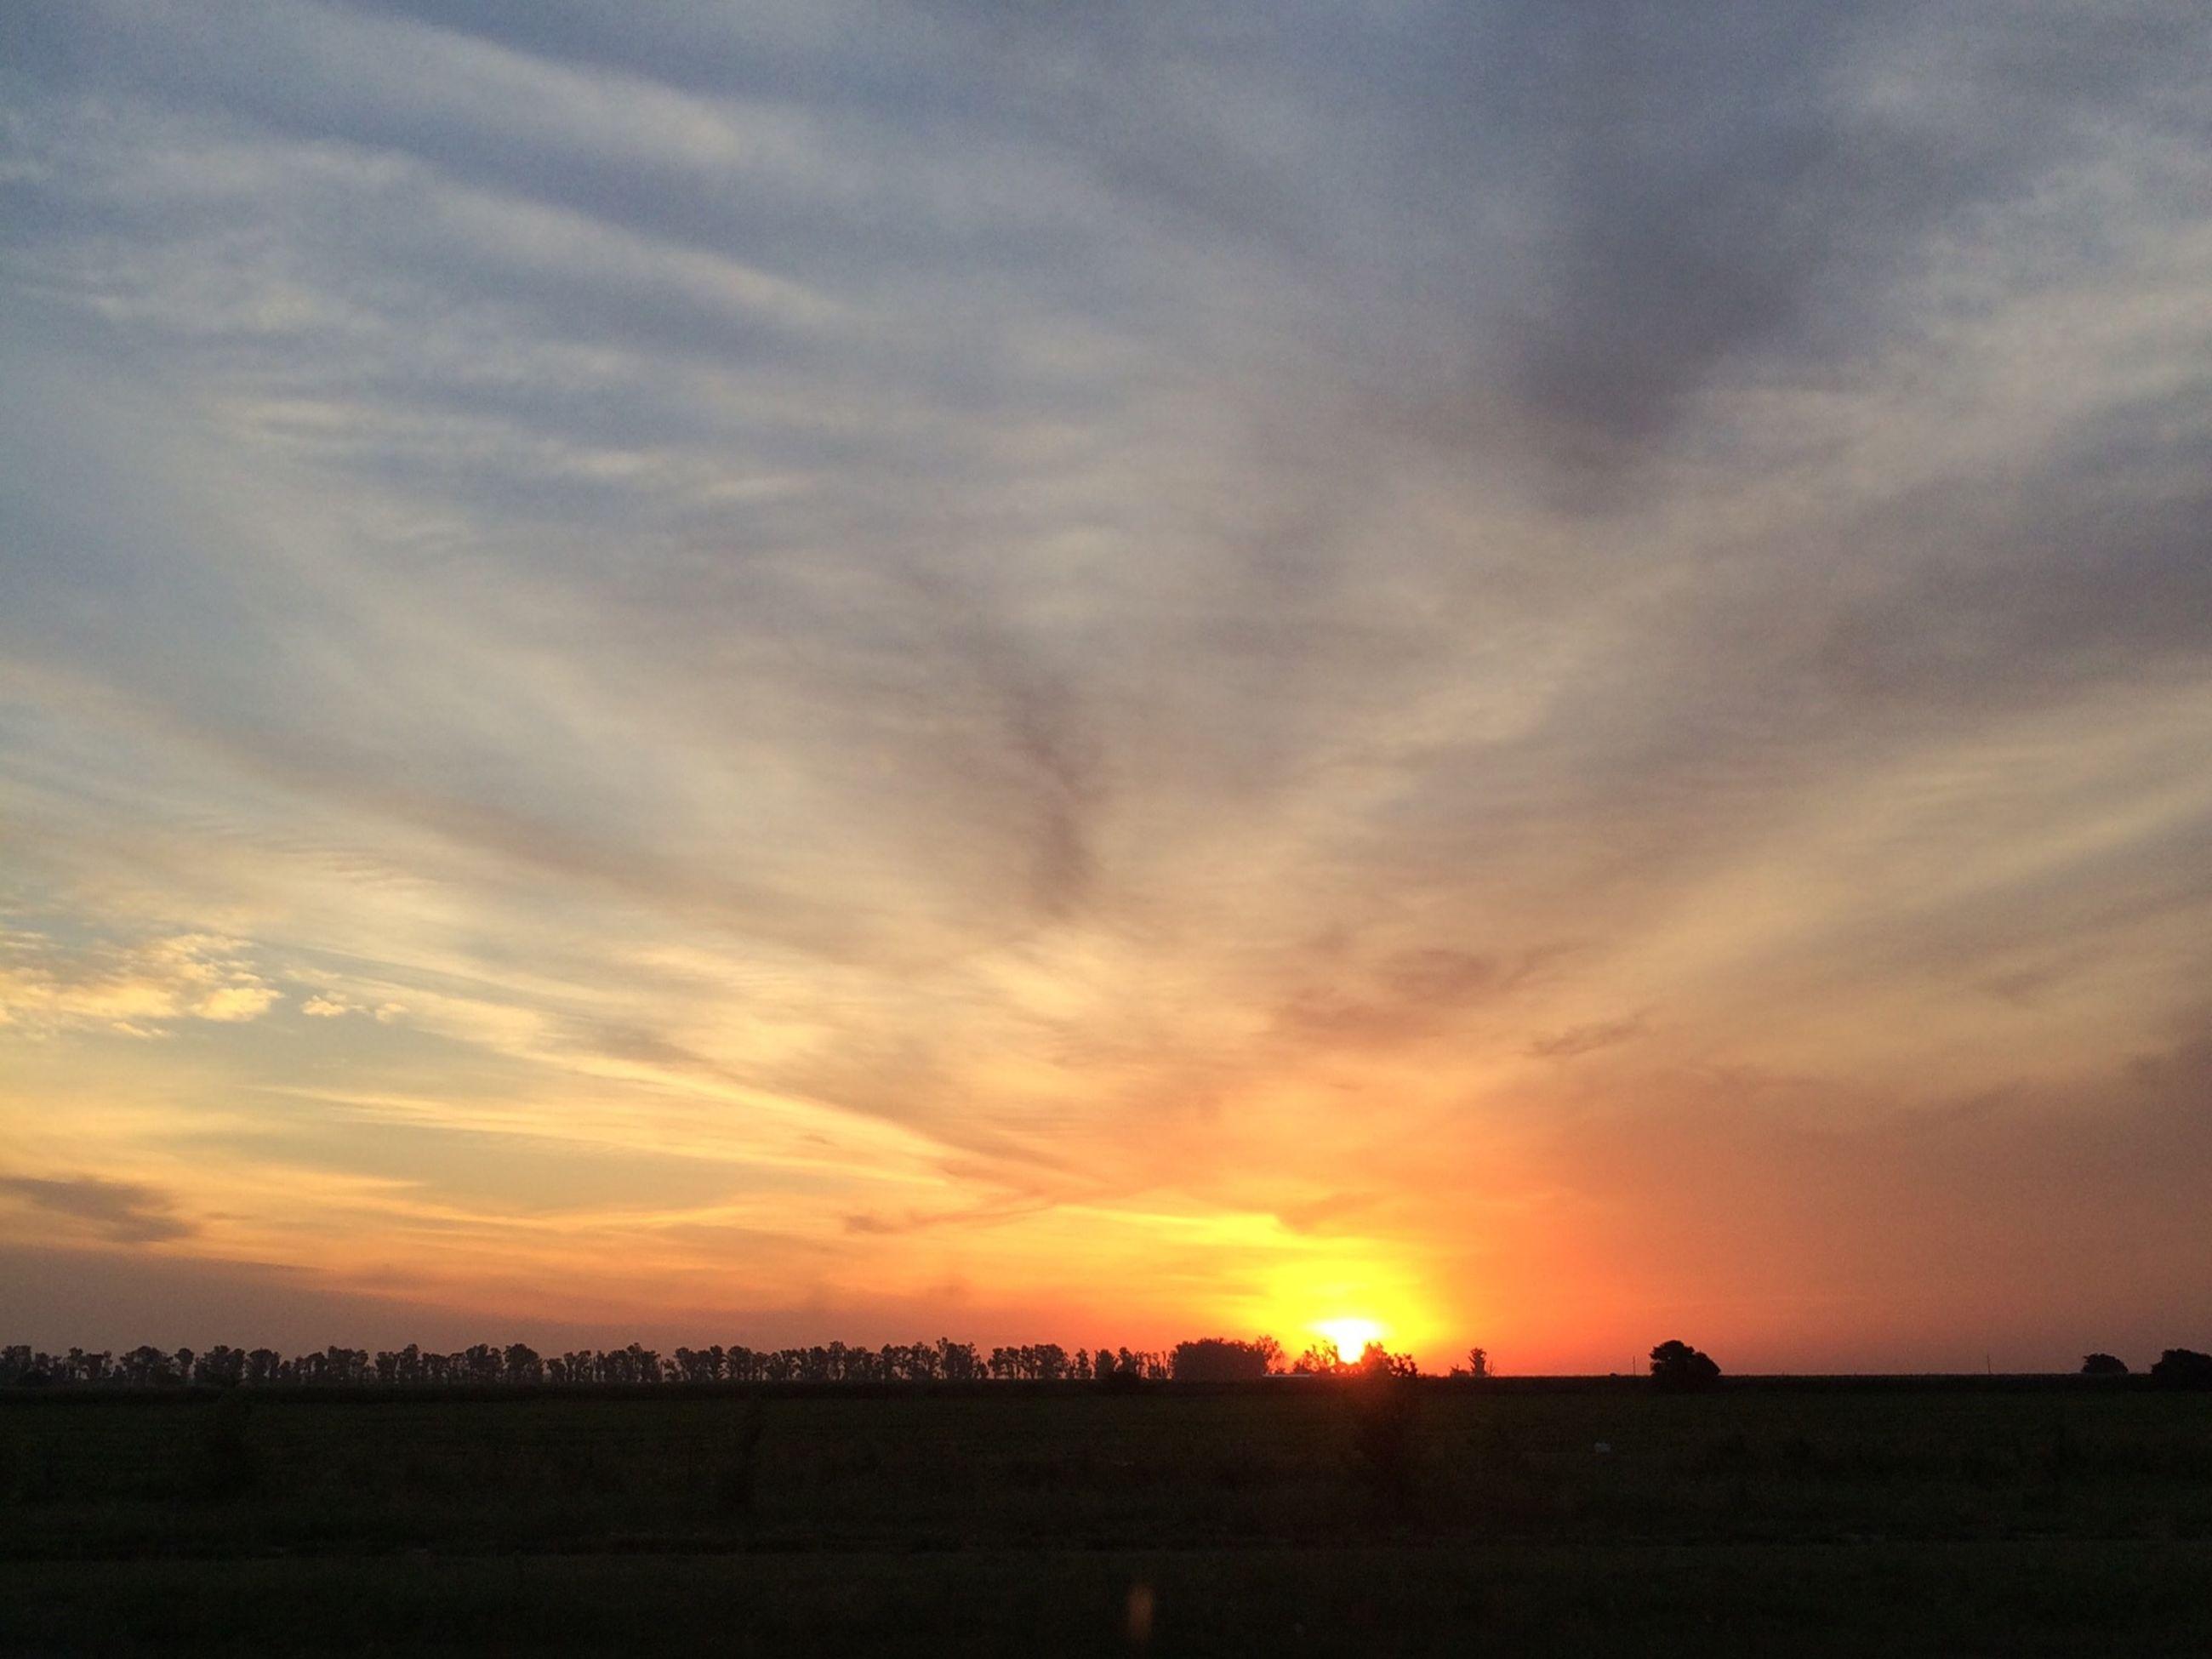 sunset, silhouette, sky, sun, orange color, tranquil scene, scenics, beauty in nature, tranquility, landscape, cloud - sky, nature, field, sunlight, idyllic, sunbeam, cloud, outdoors, no people, dramatic sky